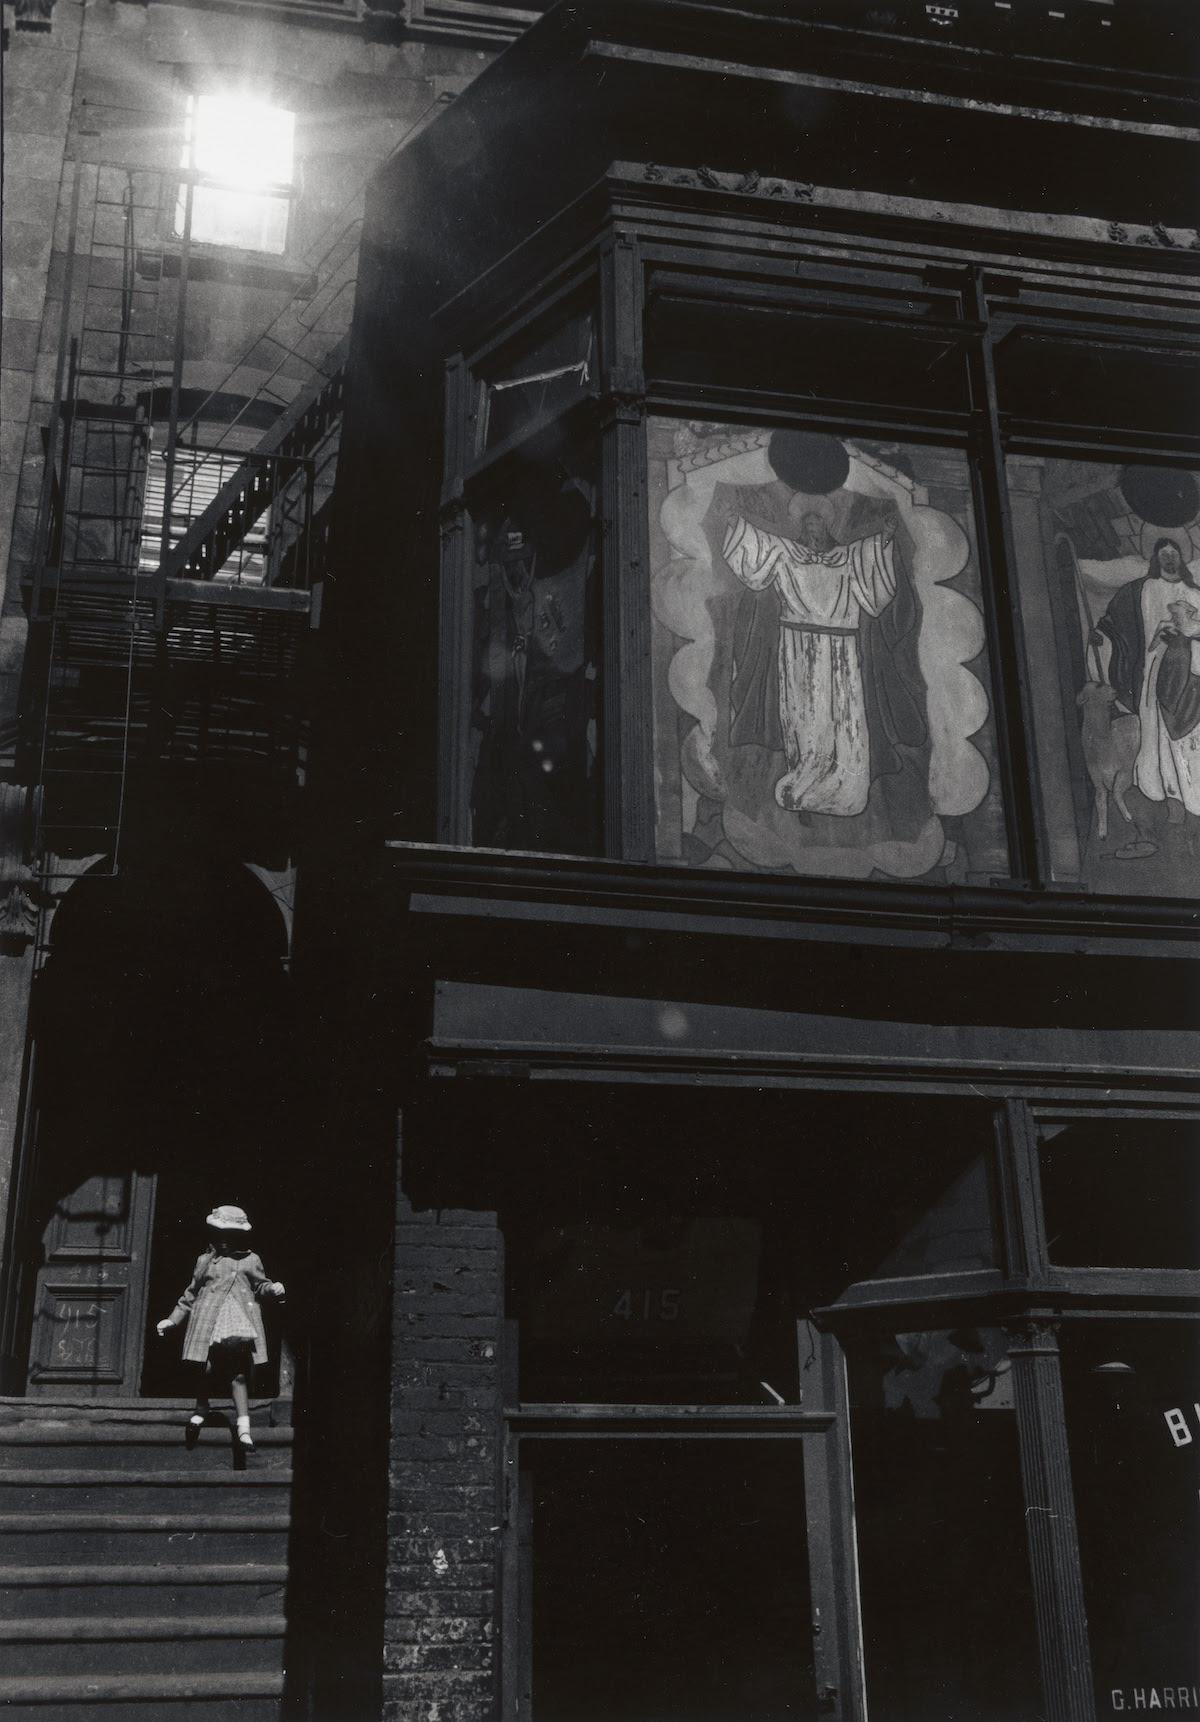 Herbert Randall, Untitled (Bed-Stuy, New York), 1960s. Gelatin silver print: sheet, 14 × 10 15/16 in. (35.56 × 27.78 cm). Virginia Museum of Fine Arts, Richmond; Arthur and Margaret Glasgow Endowment. © Herbert Randall